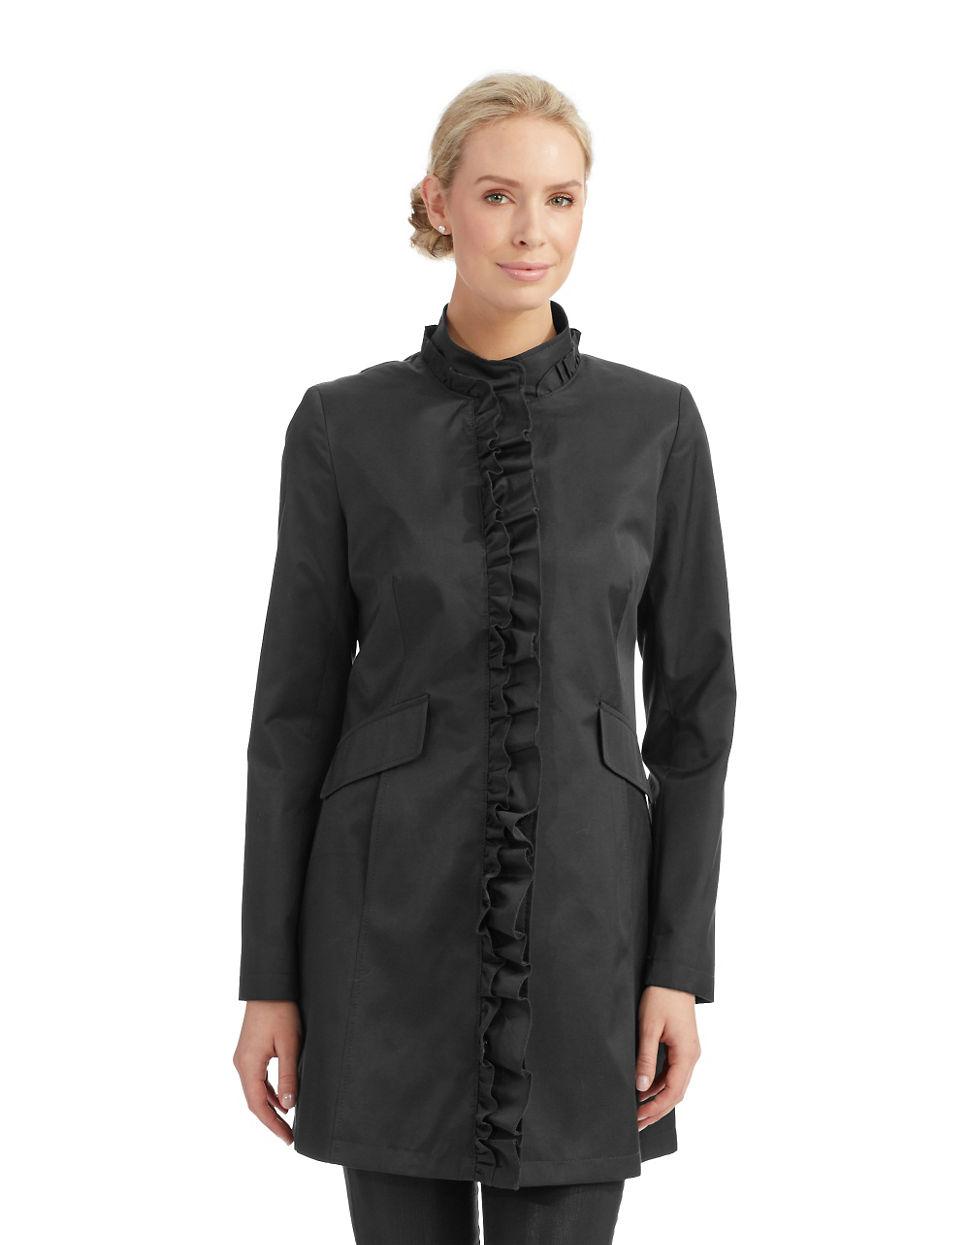 Dkny Ruffle Trench Coat in Black | Lyst